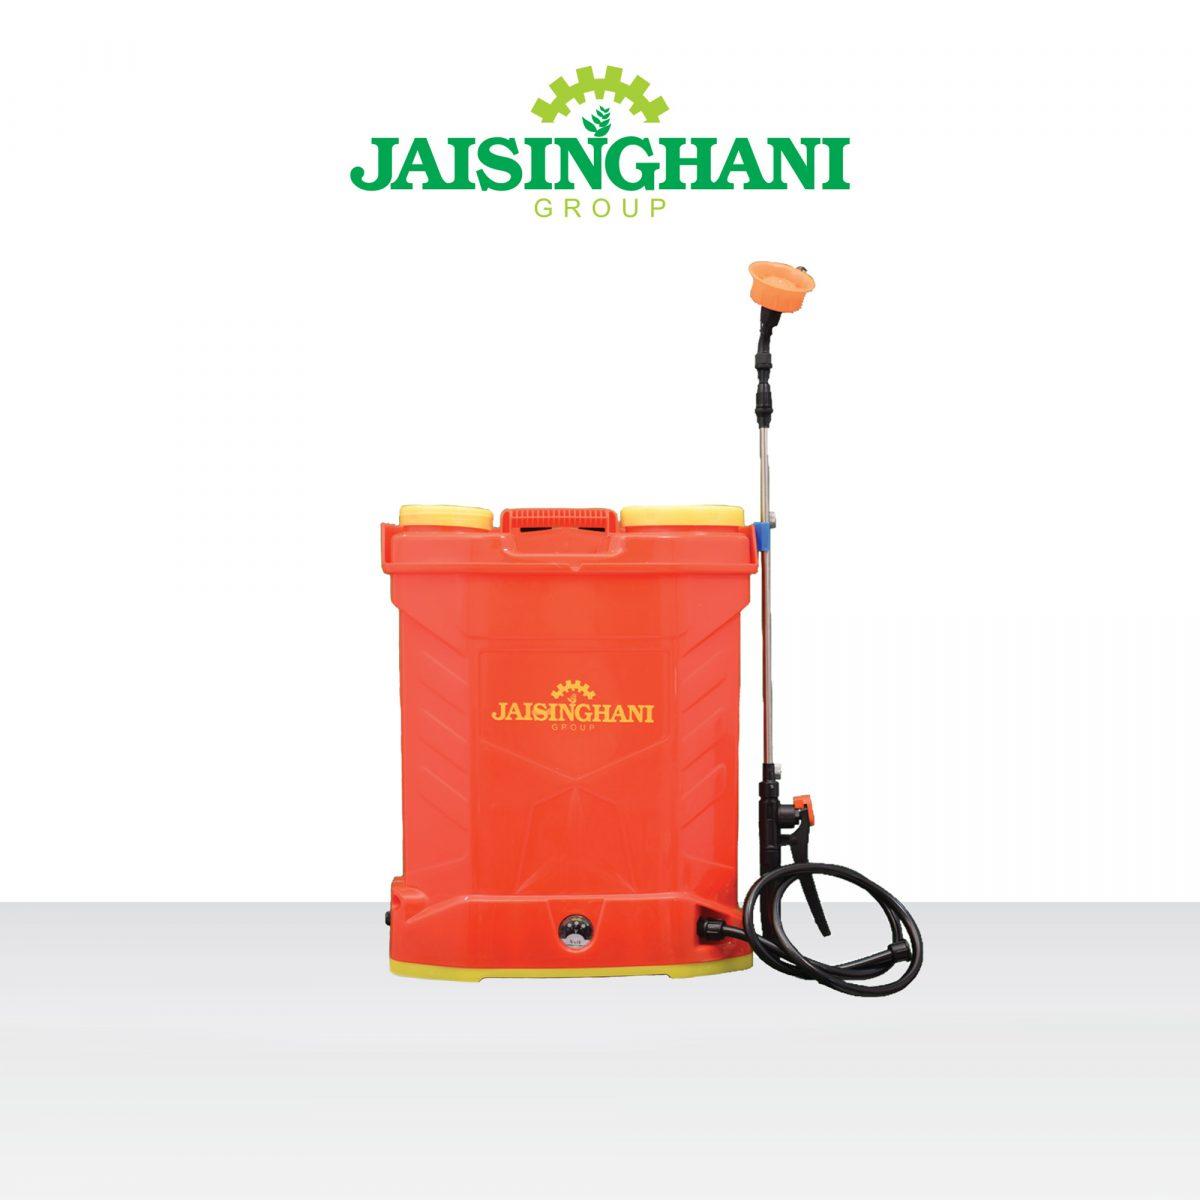 Sprayer for gardening ,agriculture , Sanitization etc